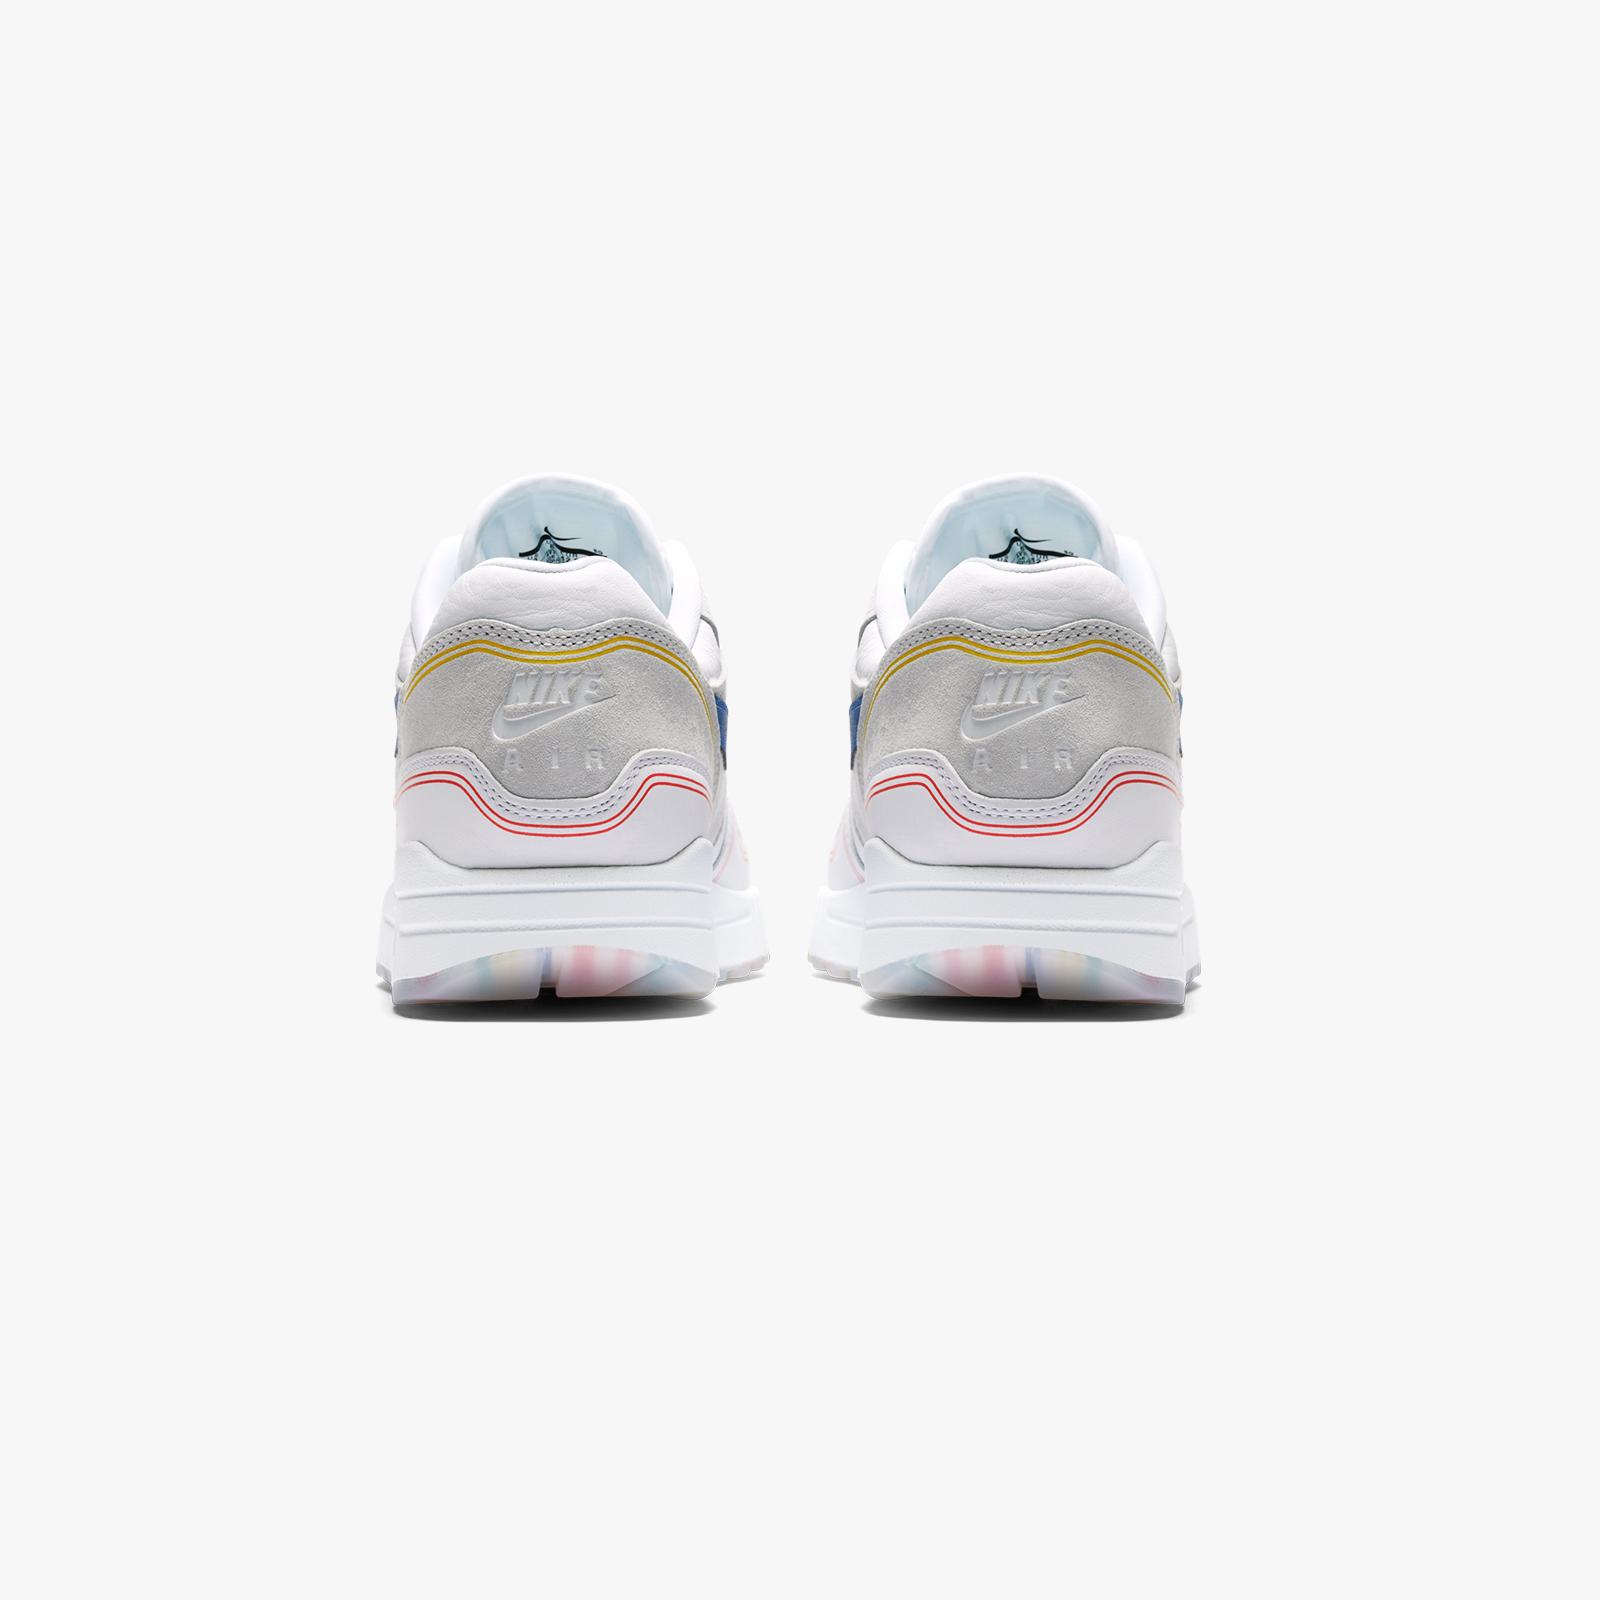 info for 7ad6f 1a85e Nike Air Max 1 - Av3735-002 - Sneakersnstuff   sneakers   streetwear online  since 1999